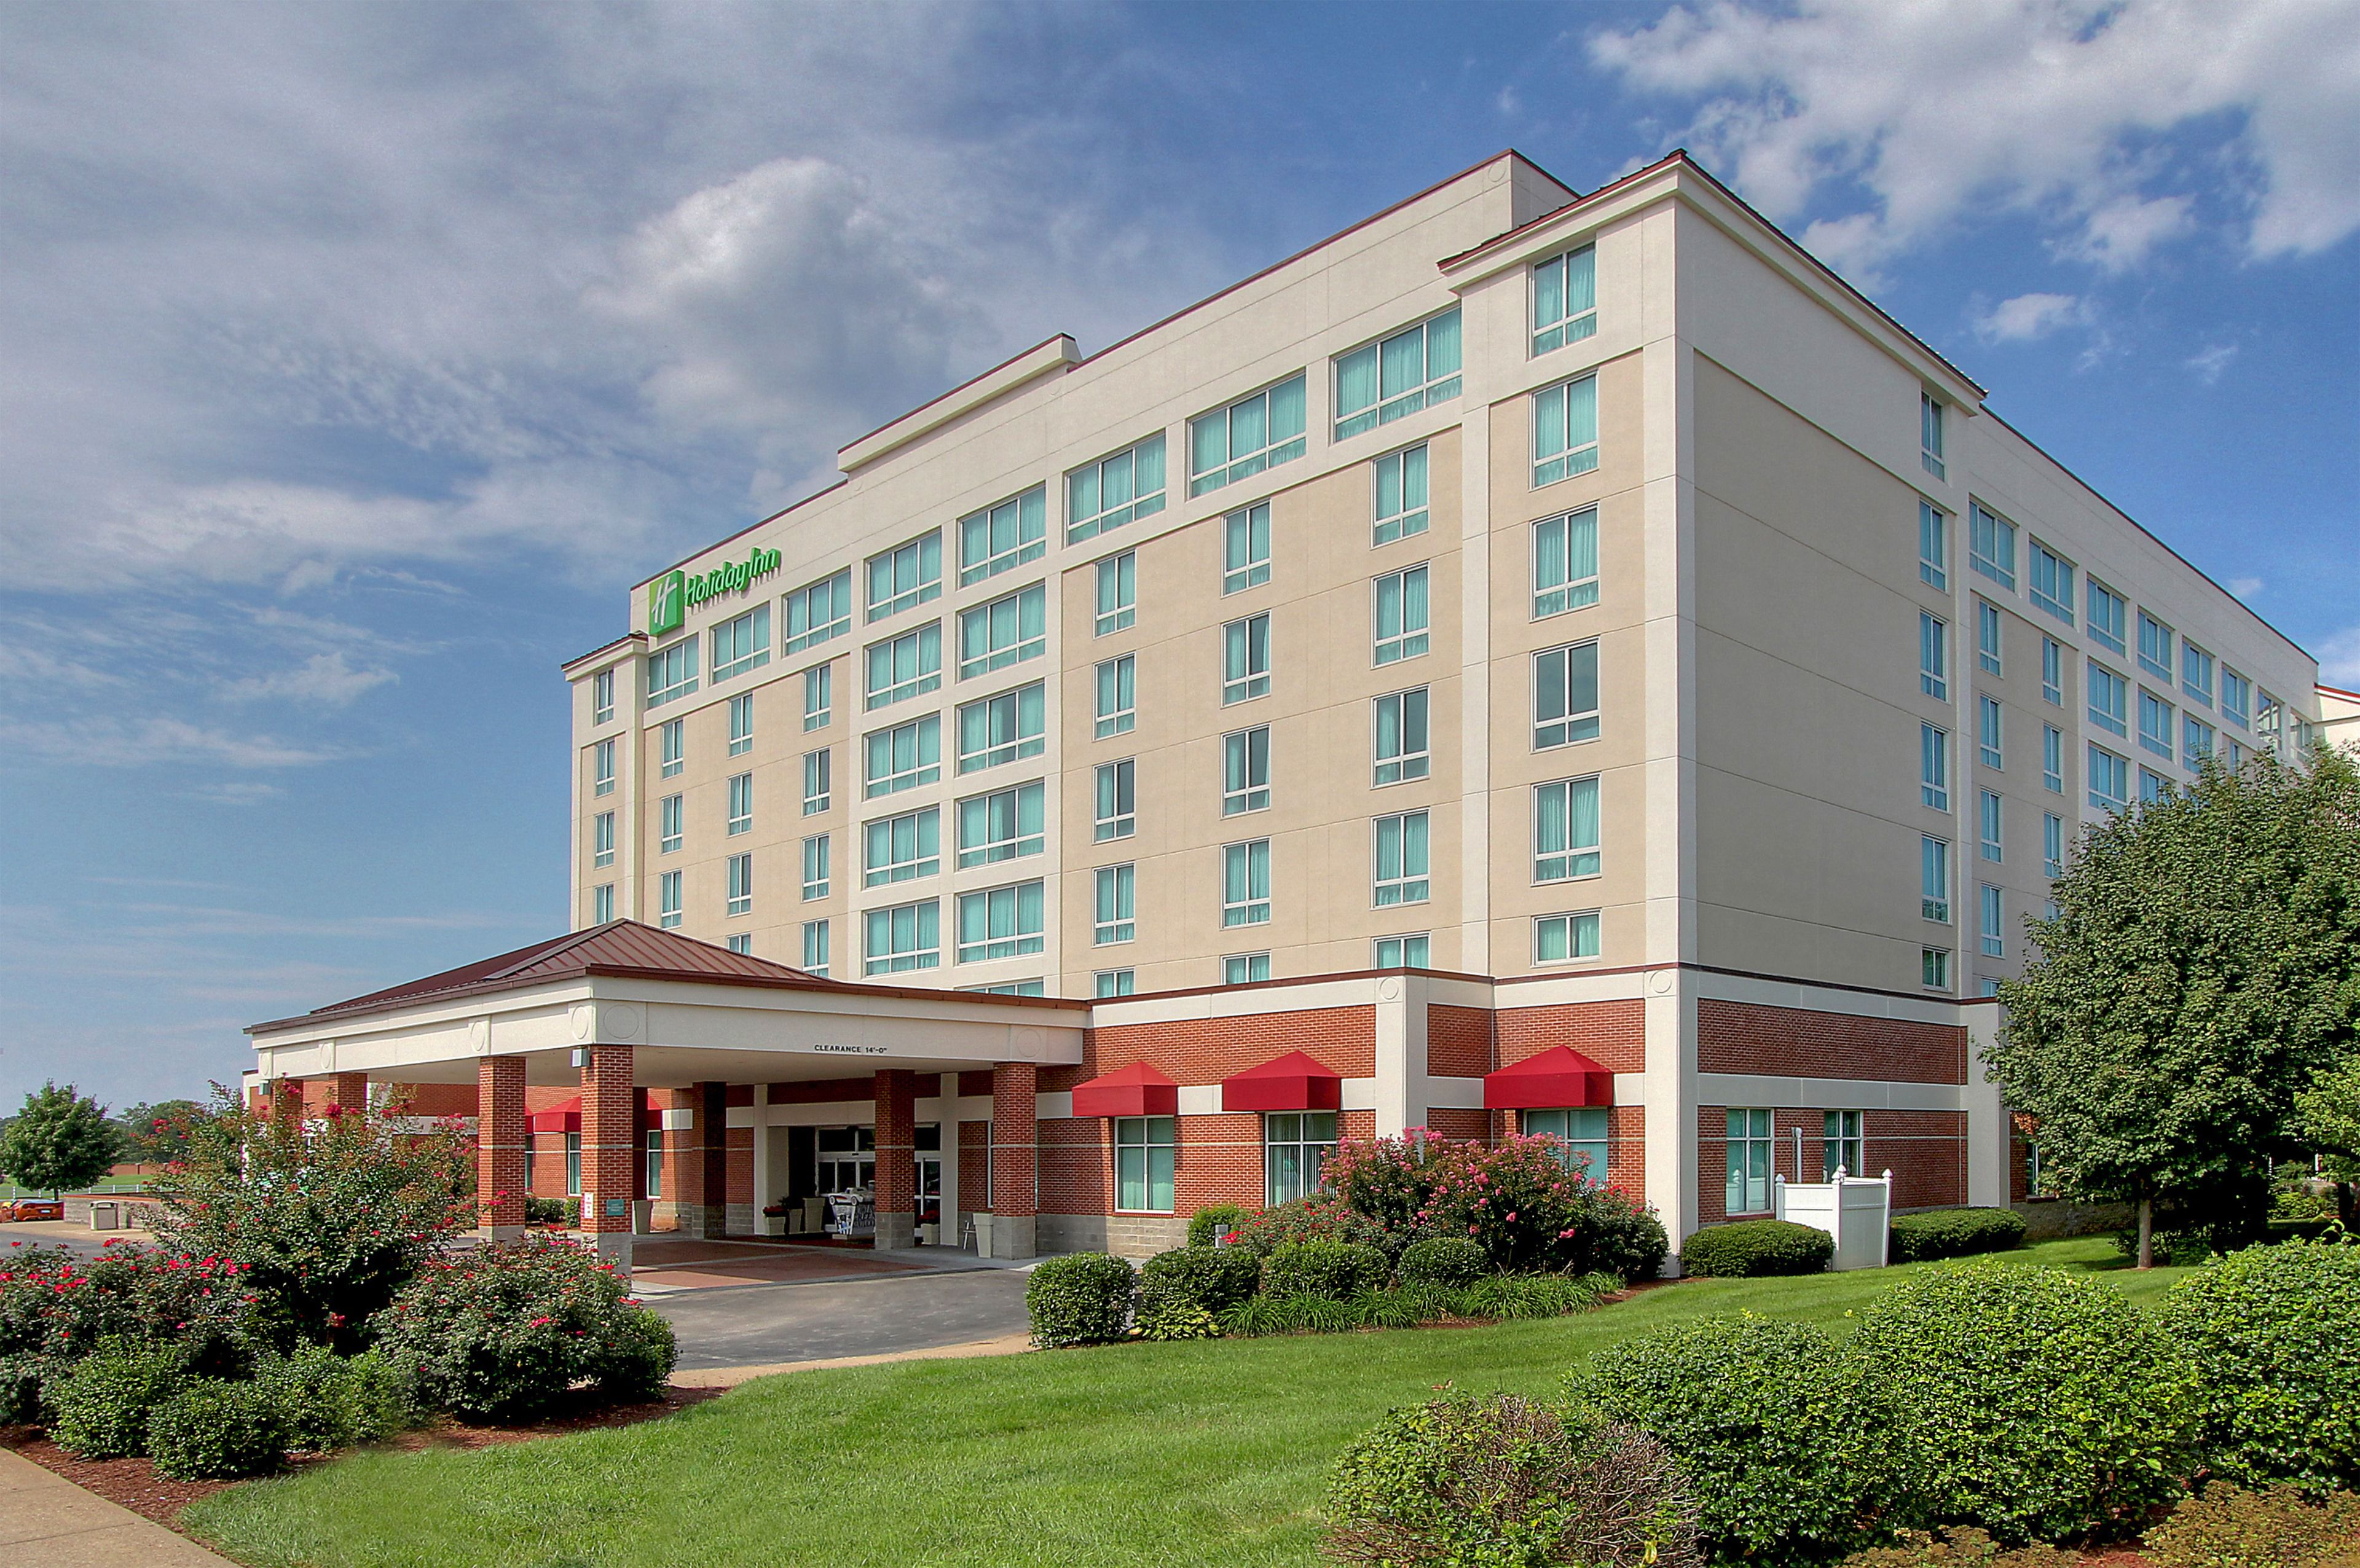 Holiday Inn University Plaza-Bowling Green image 4